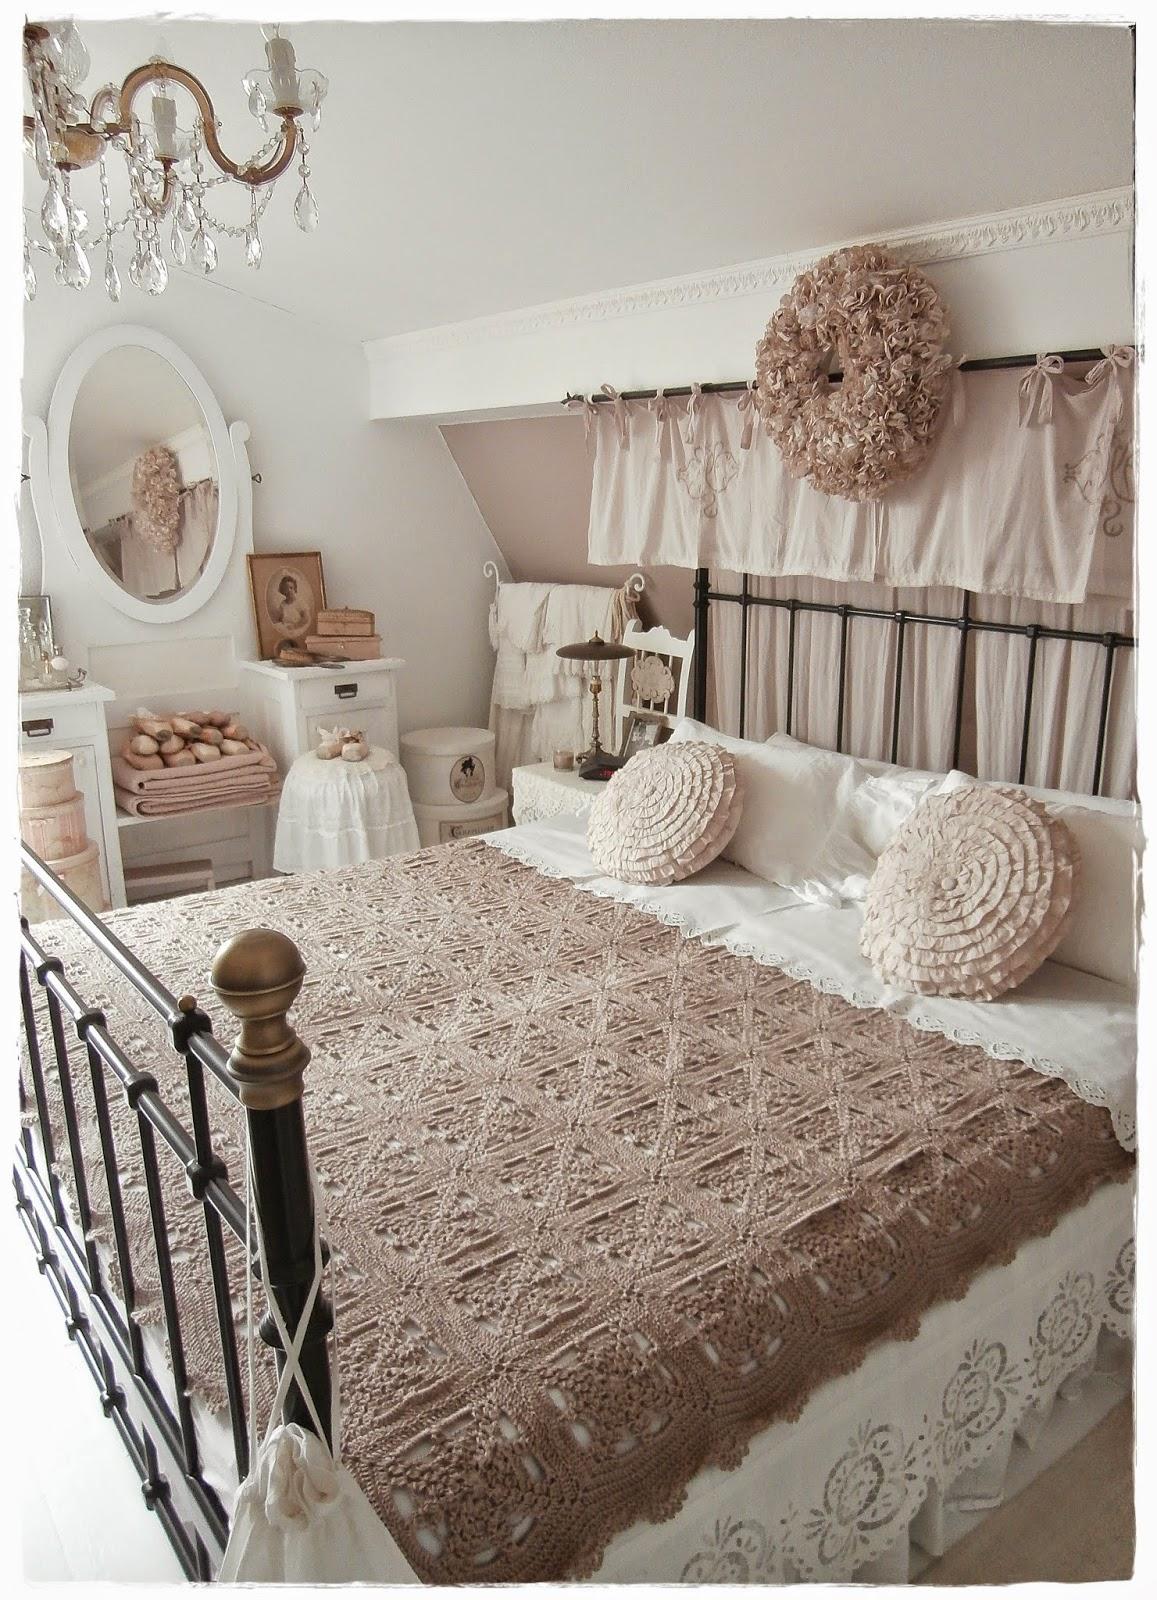 shabby landhaus neue deckerl. Black Bedroom Furniture Sets. Home Design Ideas